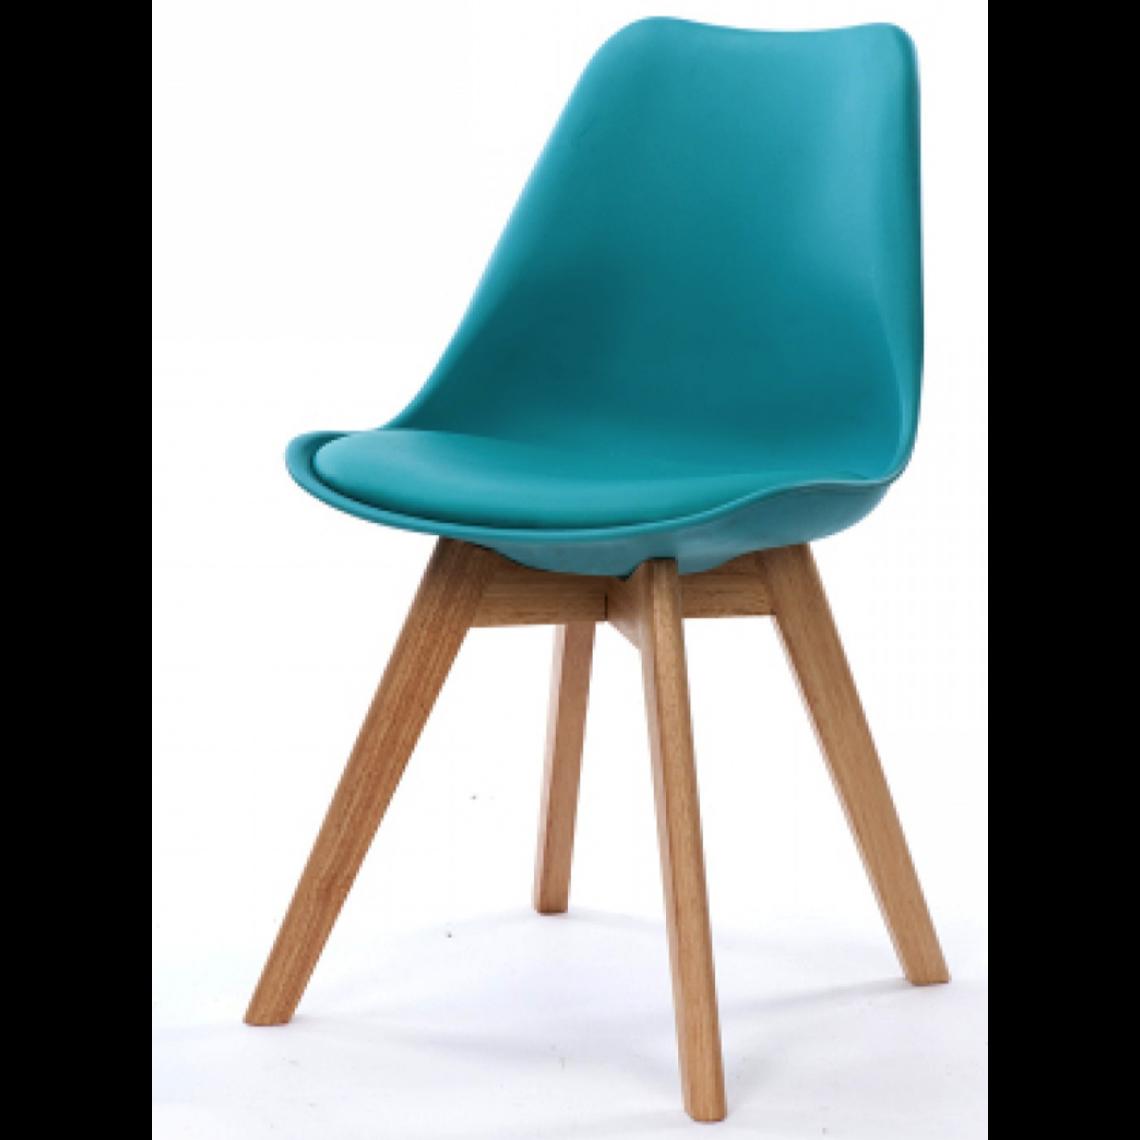 Suisses Hades3 Style Turquoise Chaise Design Scandinave OPkXiuZ